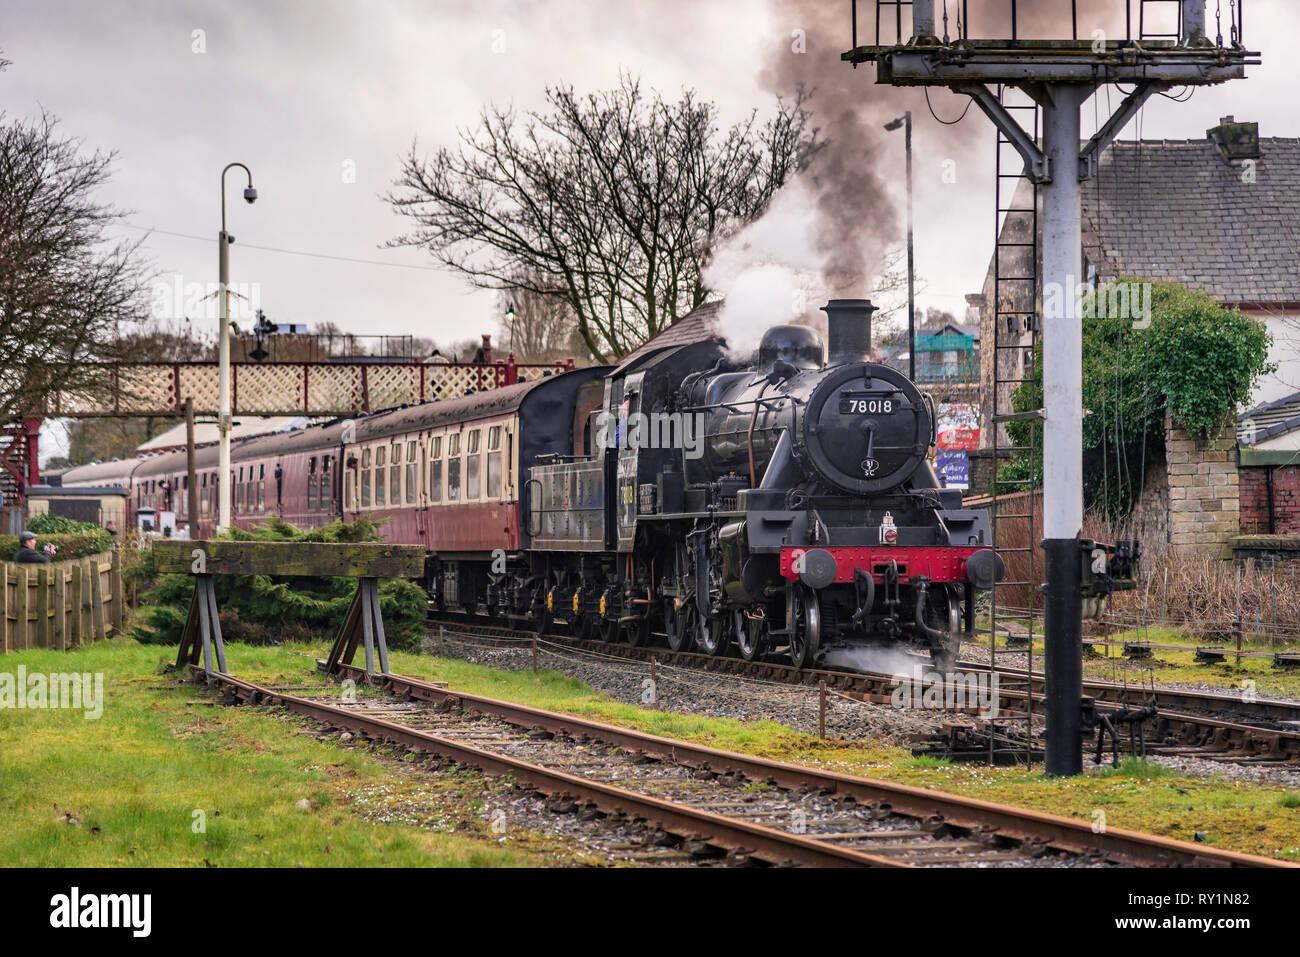 Esat Lancashire railway Spring steam gala 2019. 78018 is a BR Standard Class 2MT 2-6-0 Stock Photo